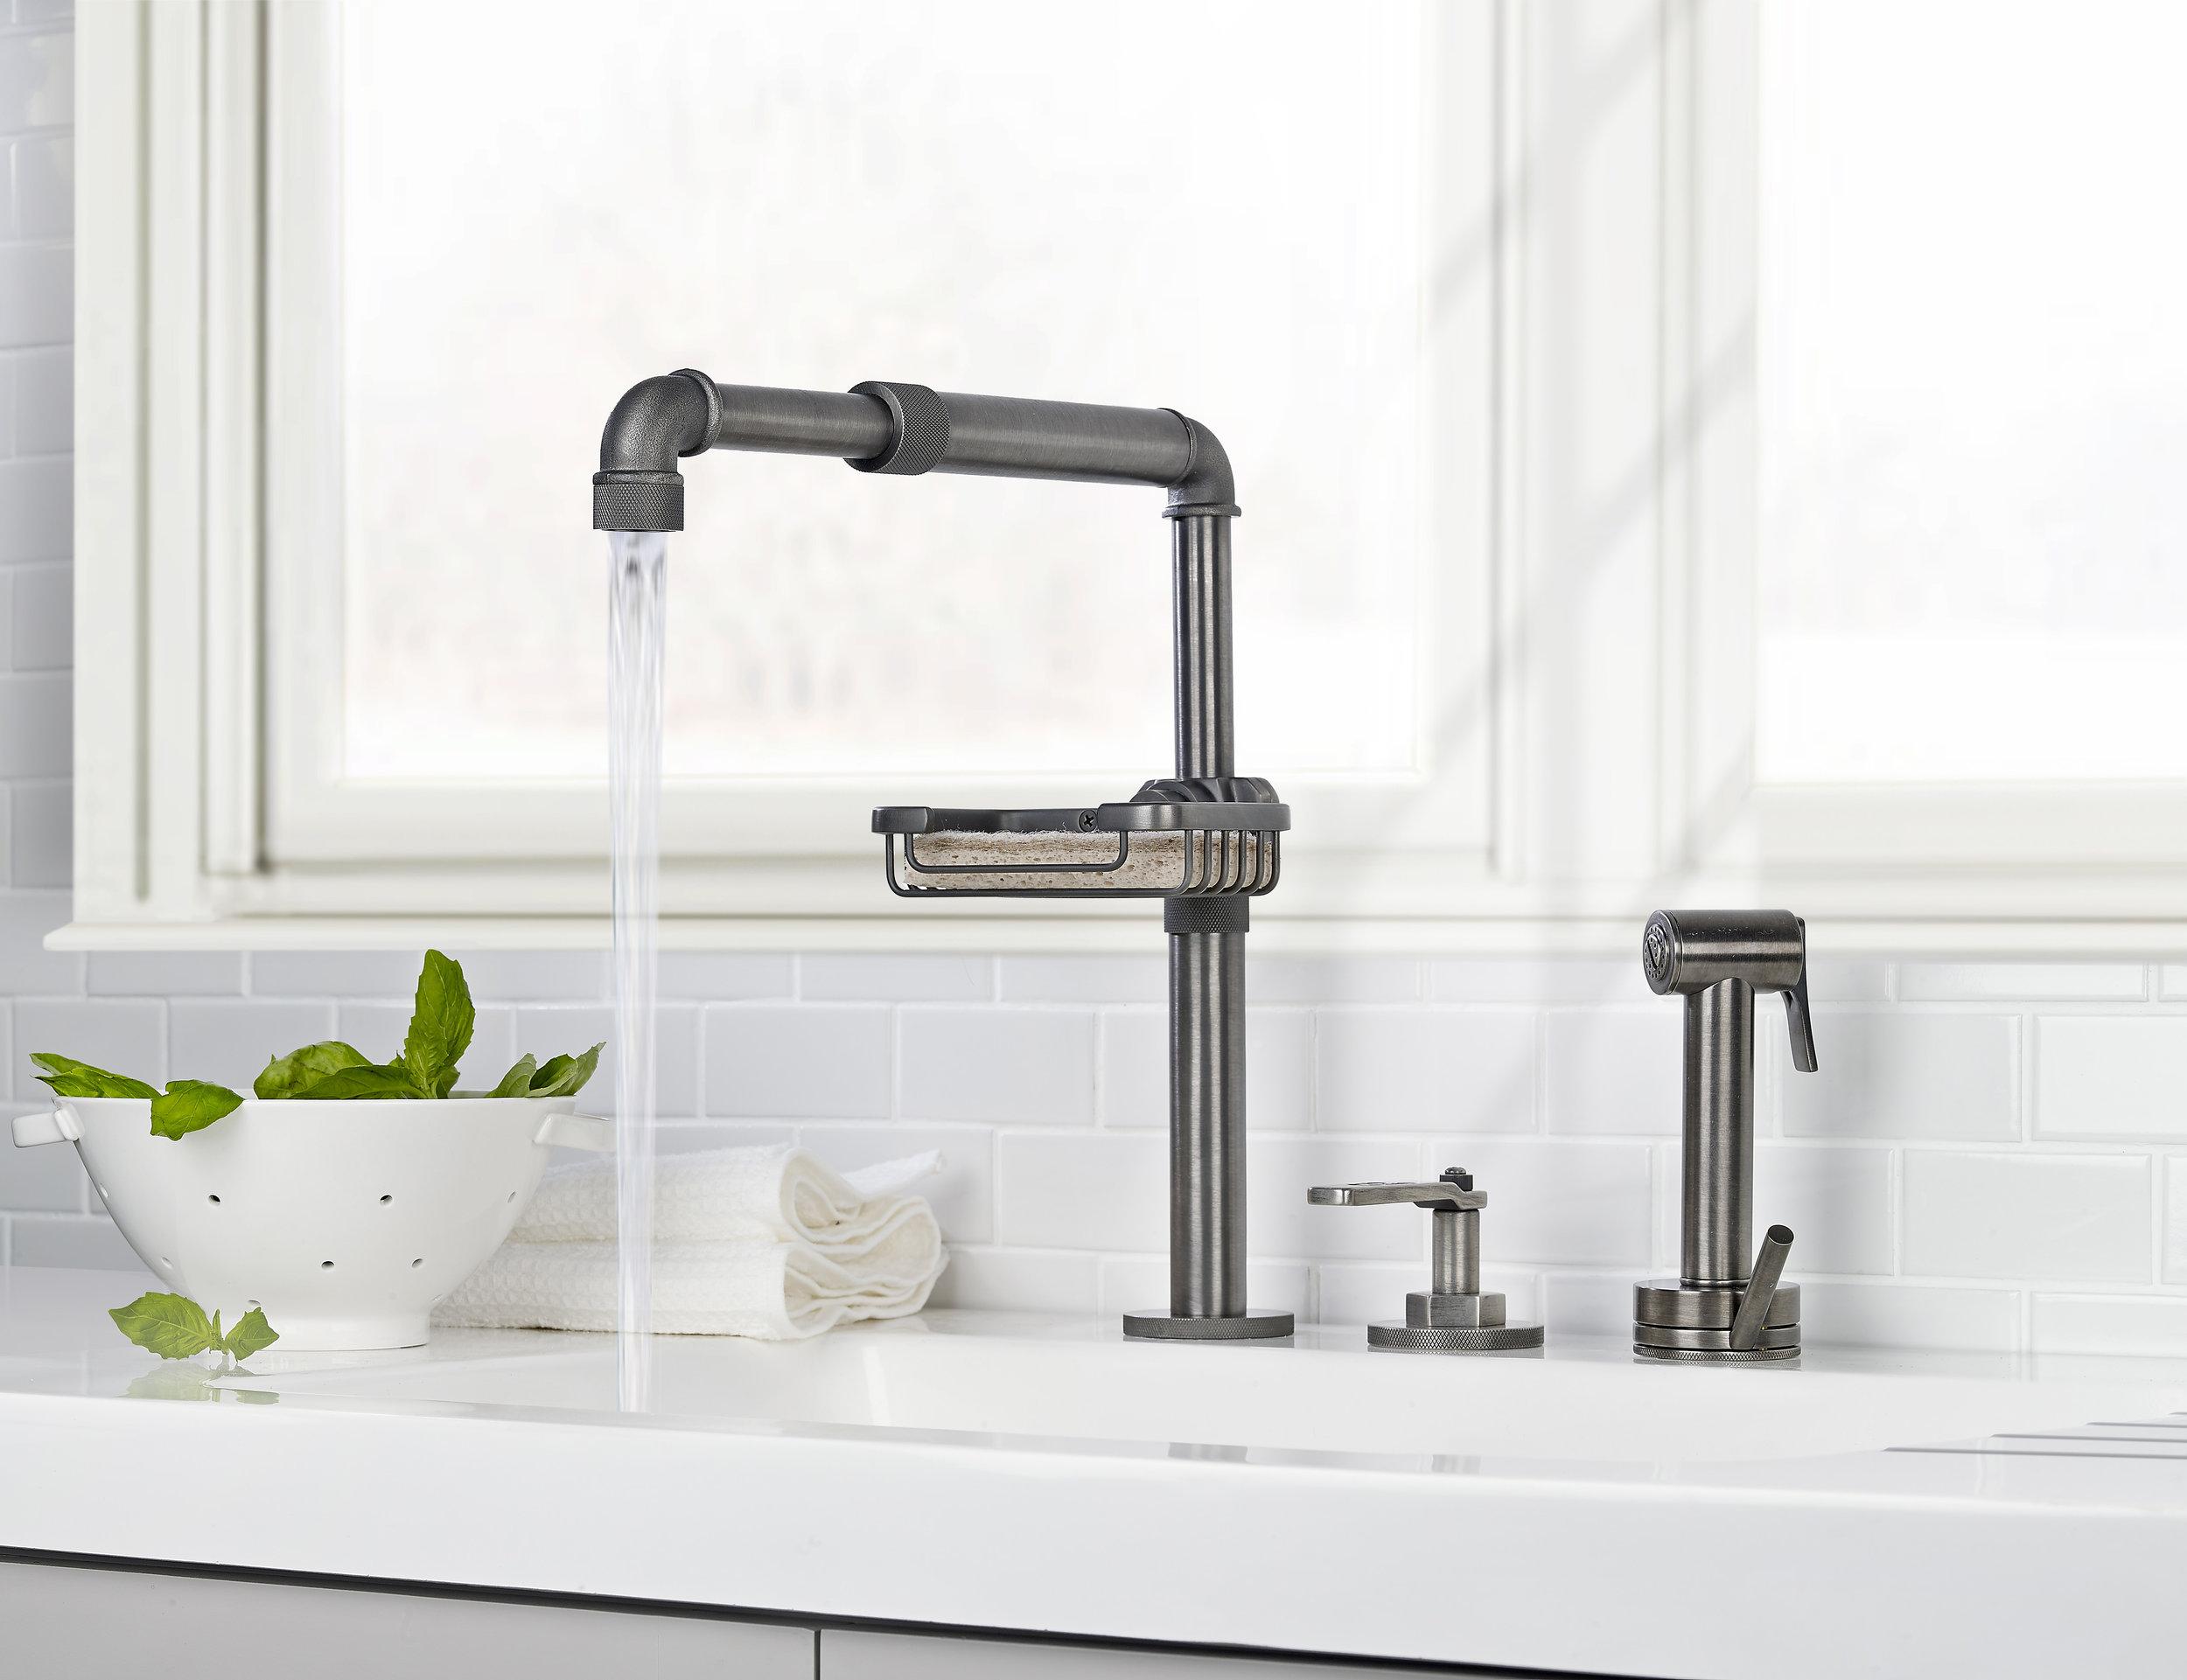 Elan Vital Monoblock Kitchen Faucet_w sponge.jpg